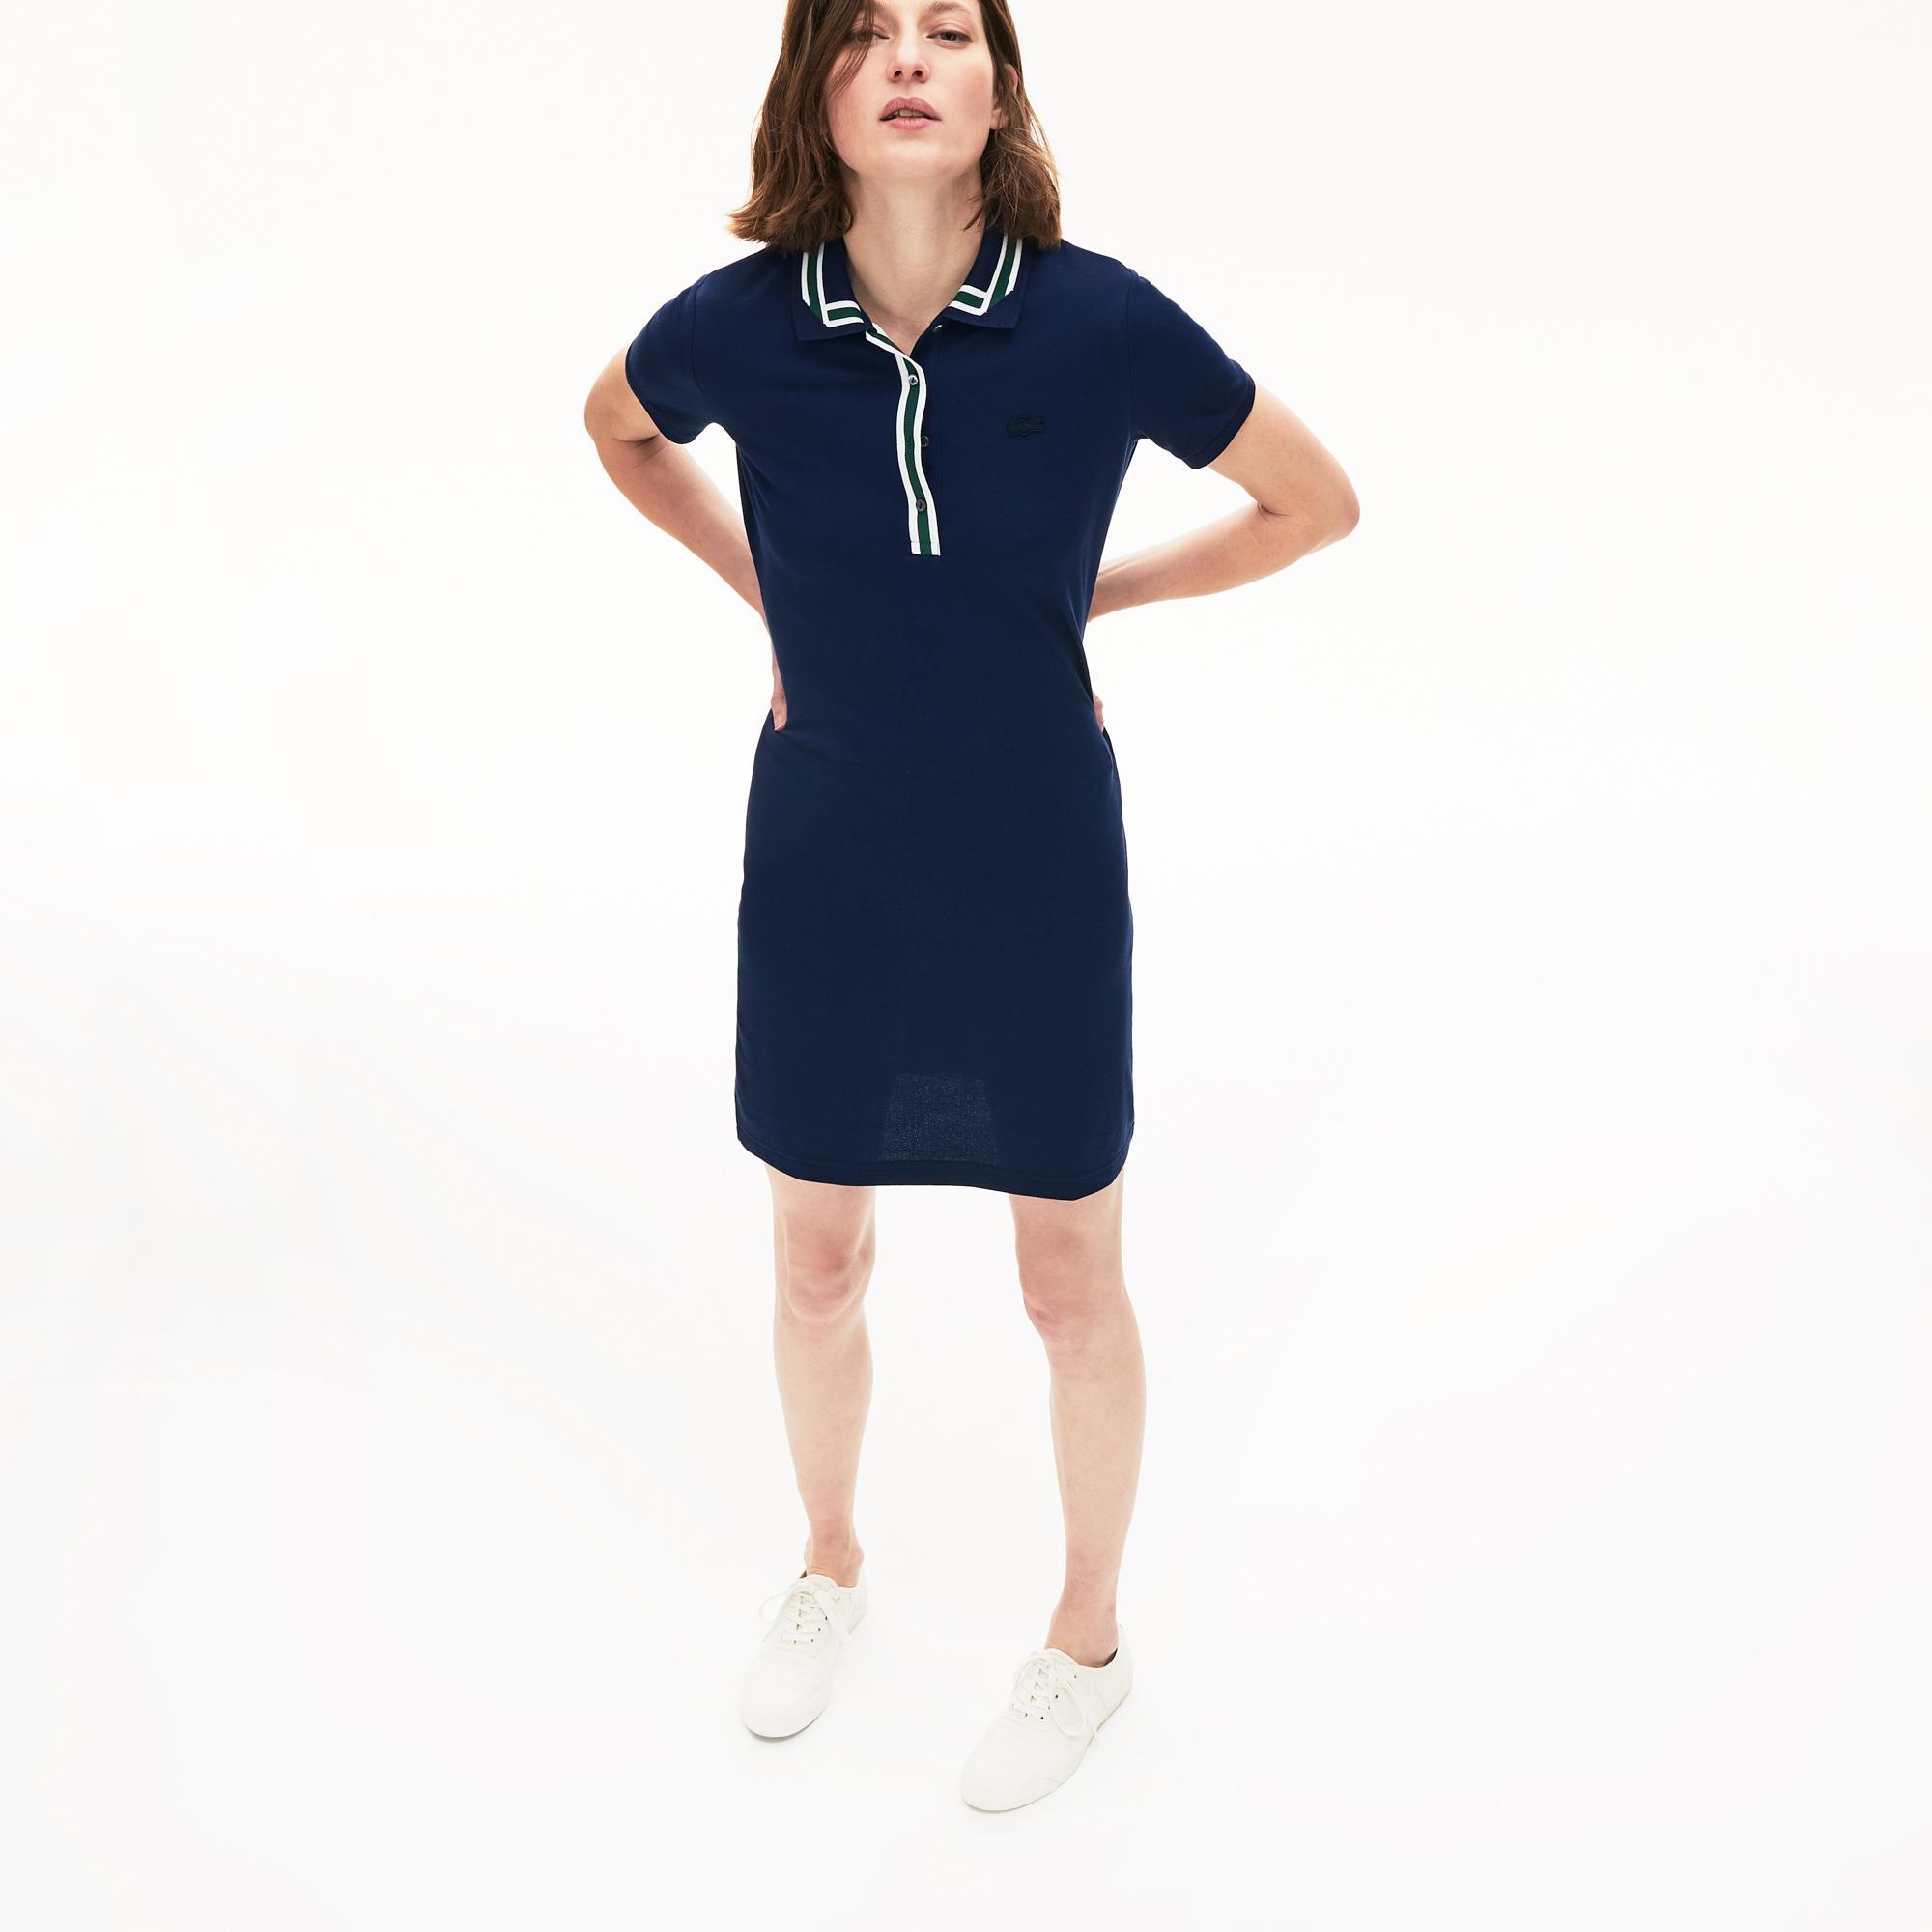 Lacoste Women's Contrast Stretch Cotton Polo Dress